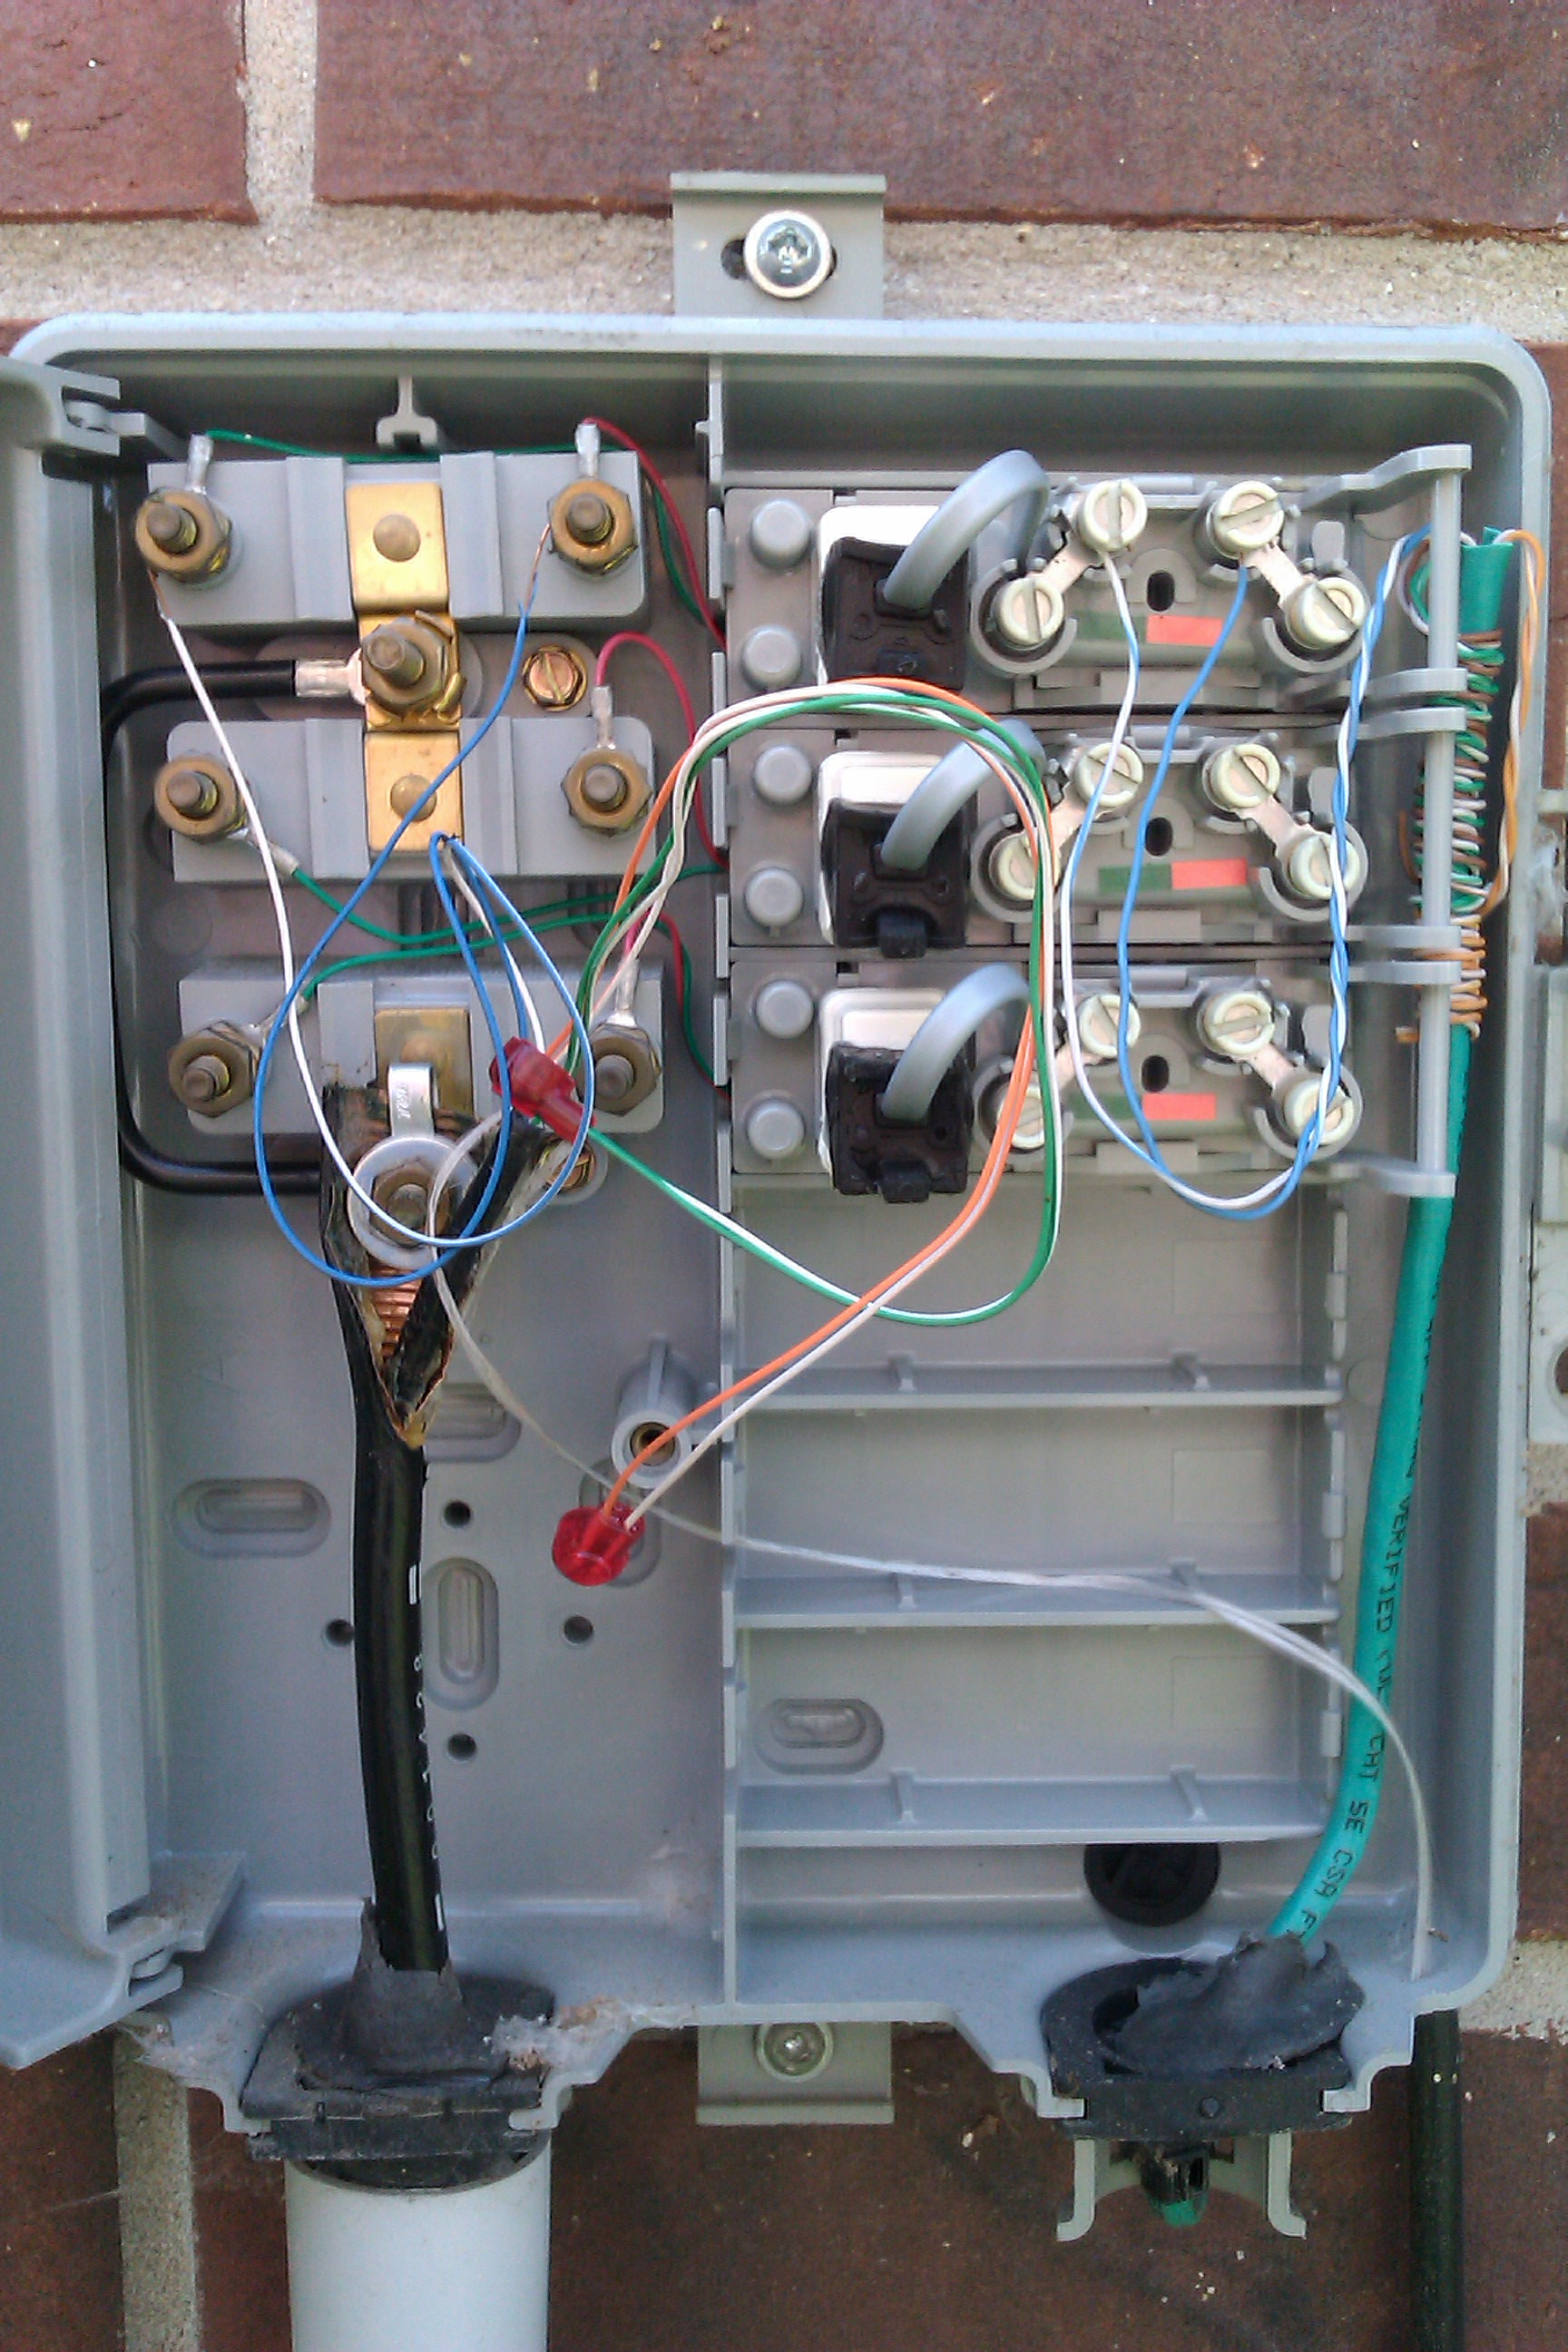 RS_4935] Phone Box Wiring Diagram On Verizon Telephone Box Wiring Diagram  Schematic Wiring Gresi Momece Mohammedshrine Librar Wiring 101